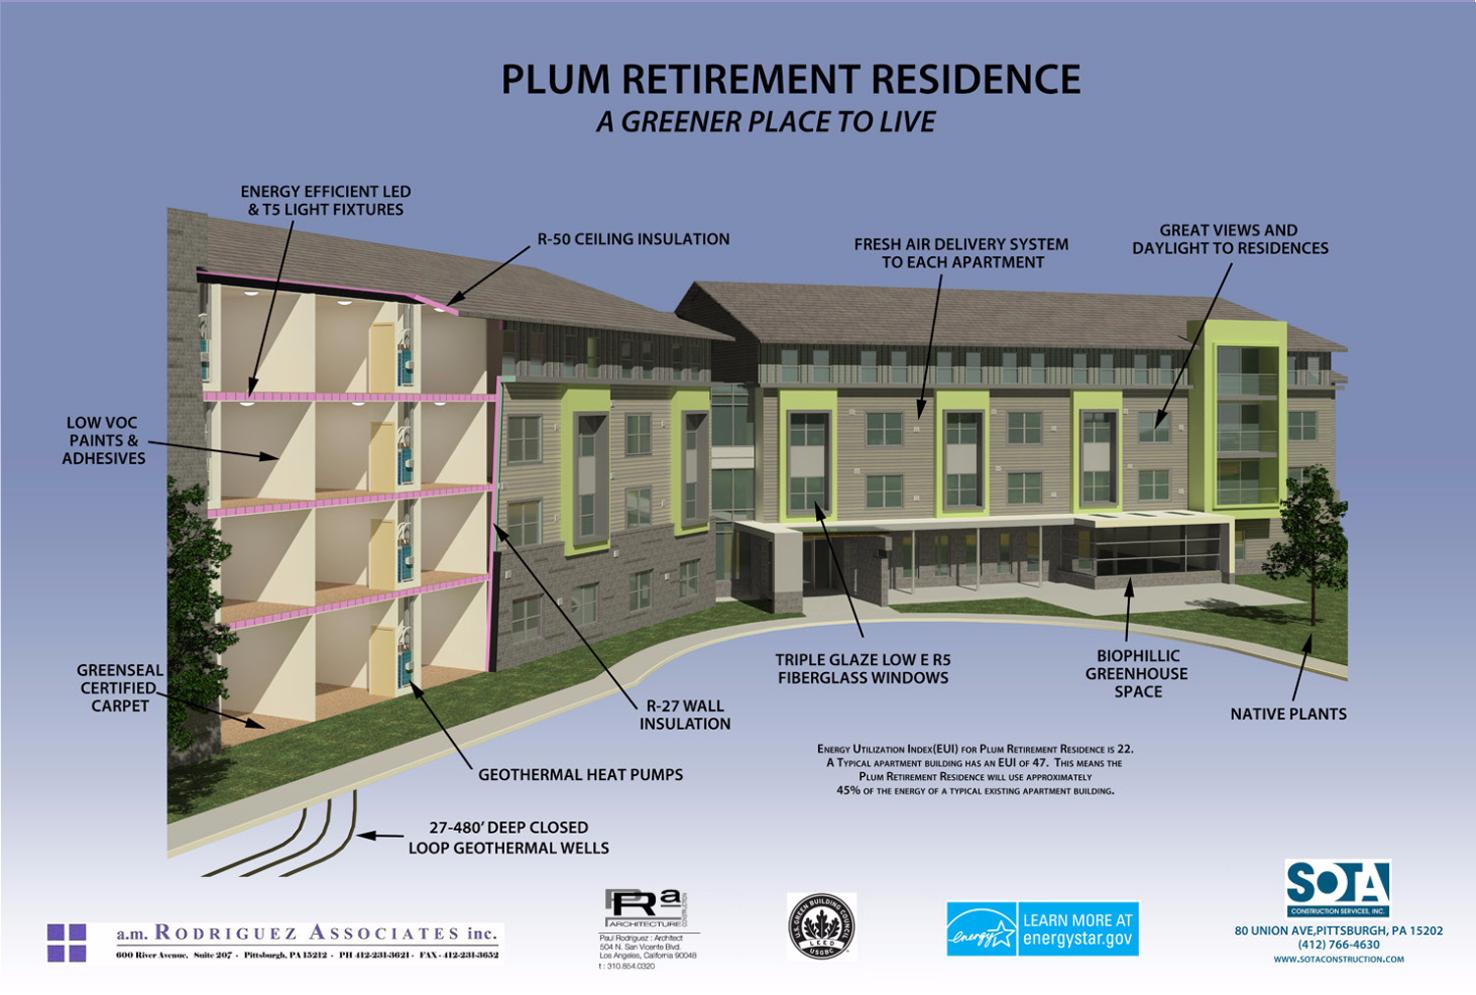 Plum Retirement Residence Cutaway